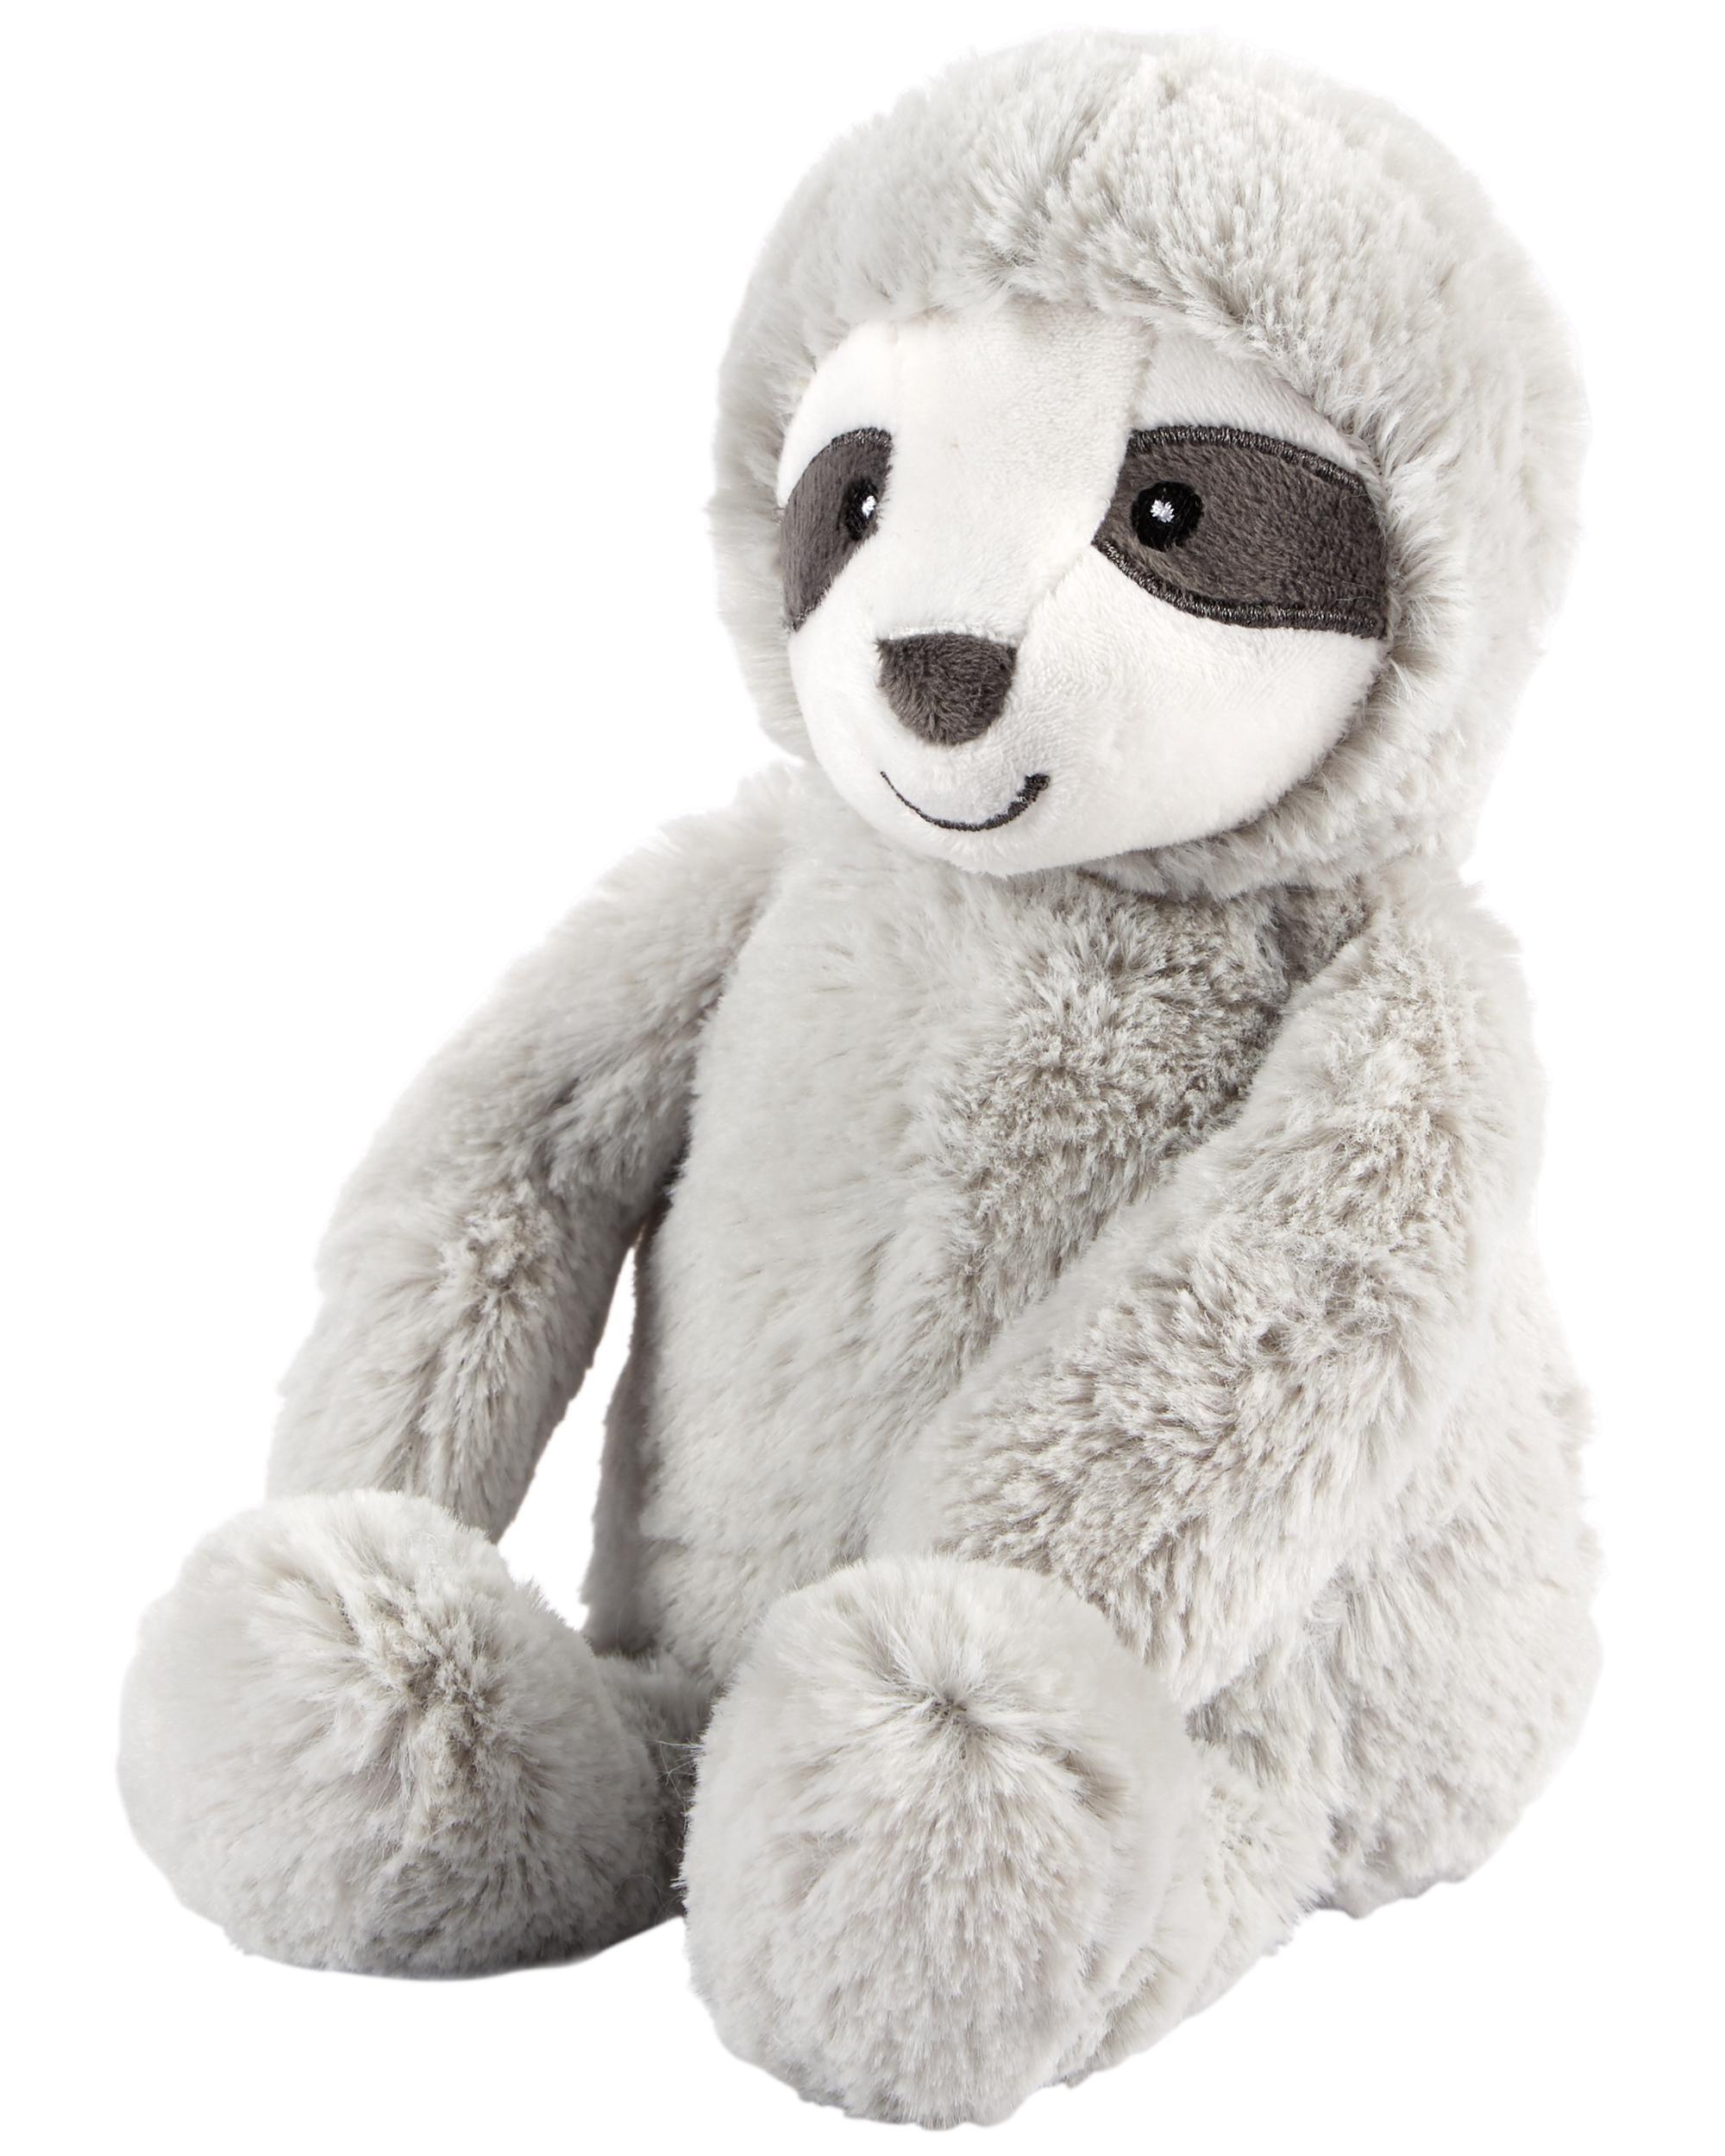 Carters Sloth Plush